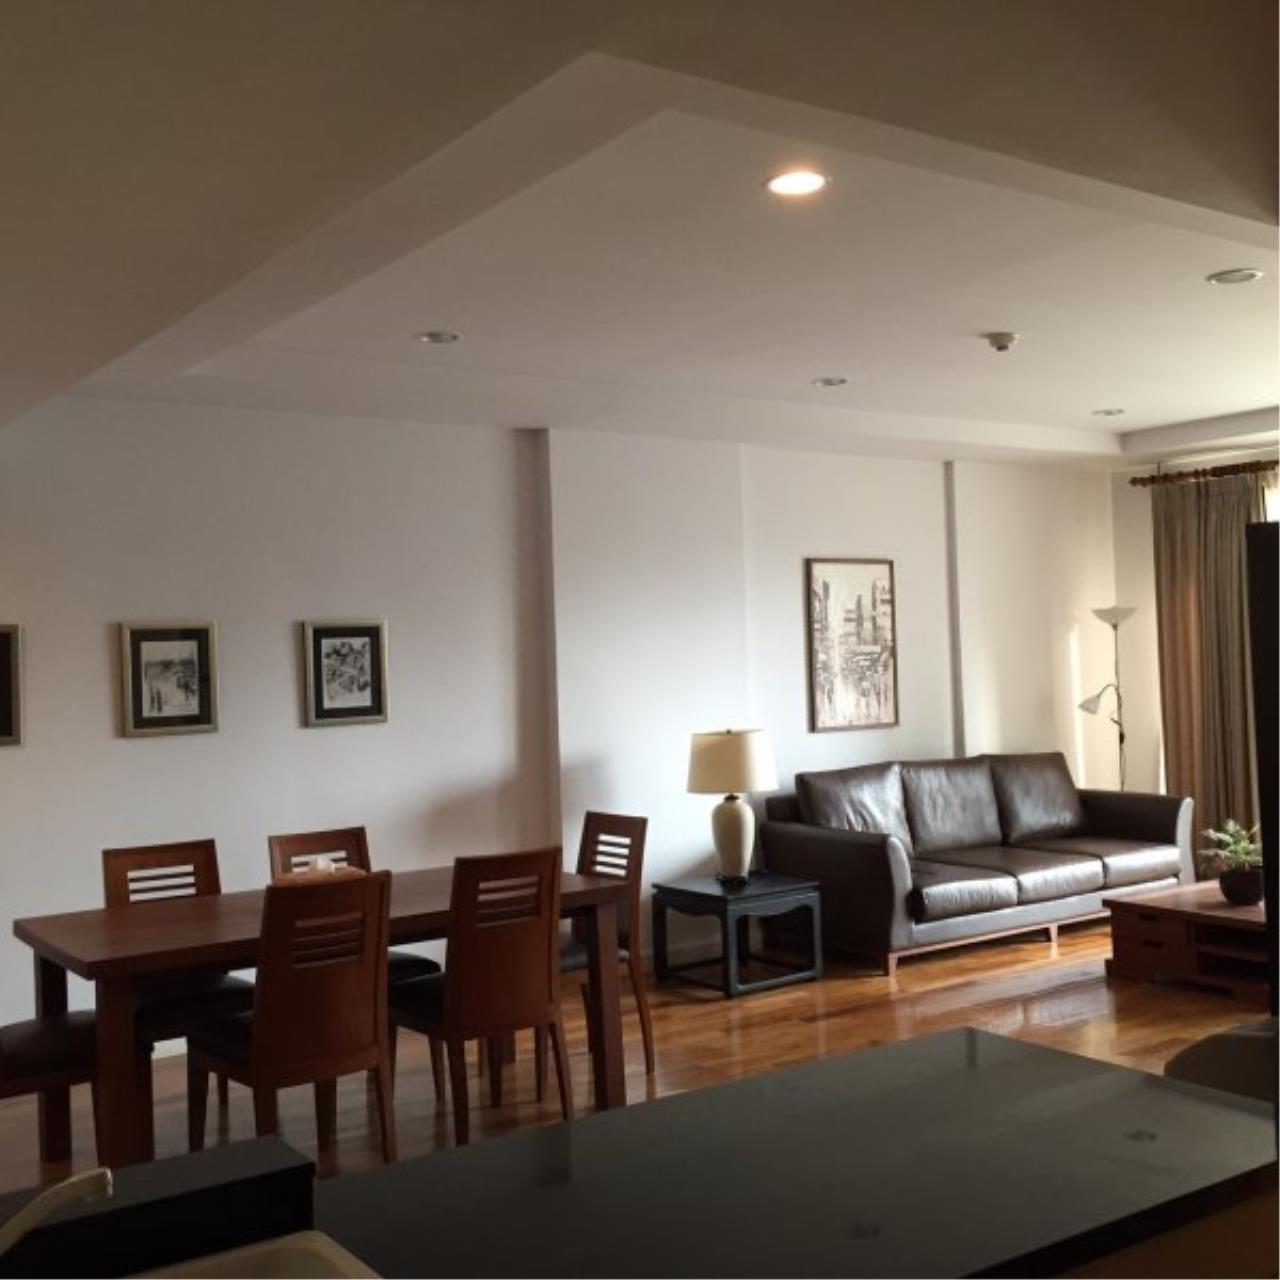 Piri Property Agency's Modern 2 Bedrooms in the Baan Nunthasiri Condo for sale on mid floor 2